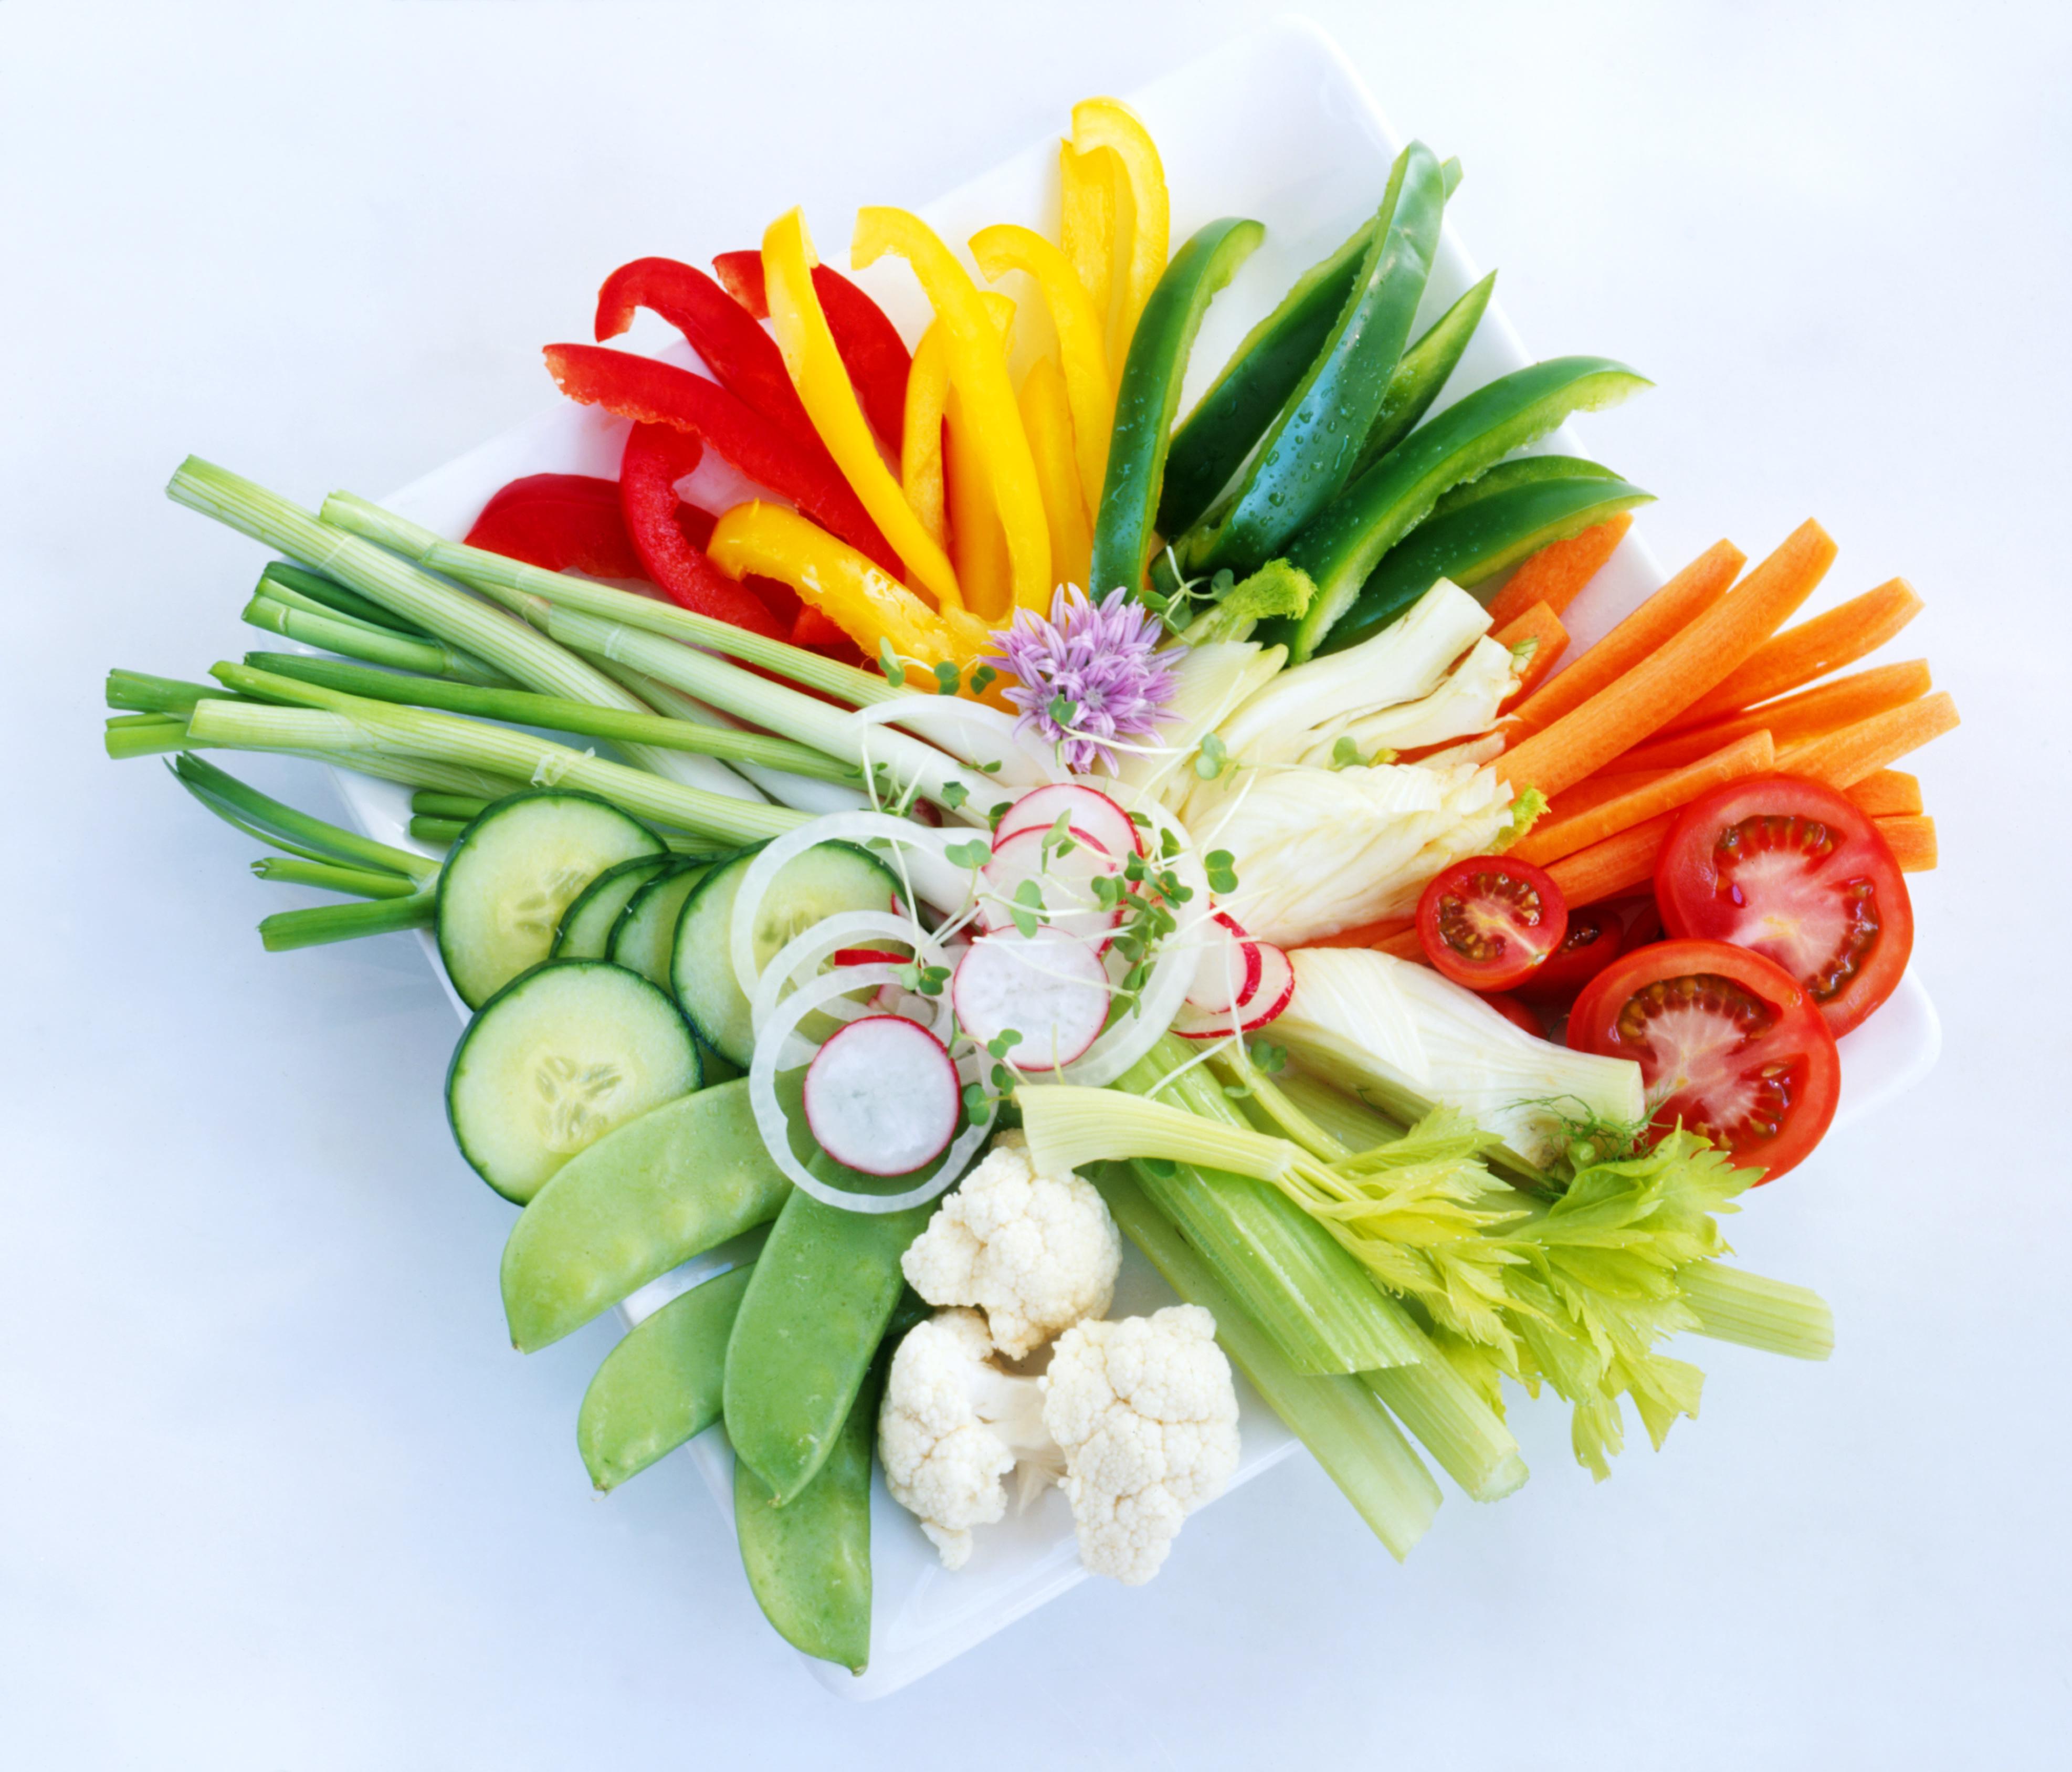 Sliced & chopped raw vegetables